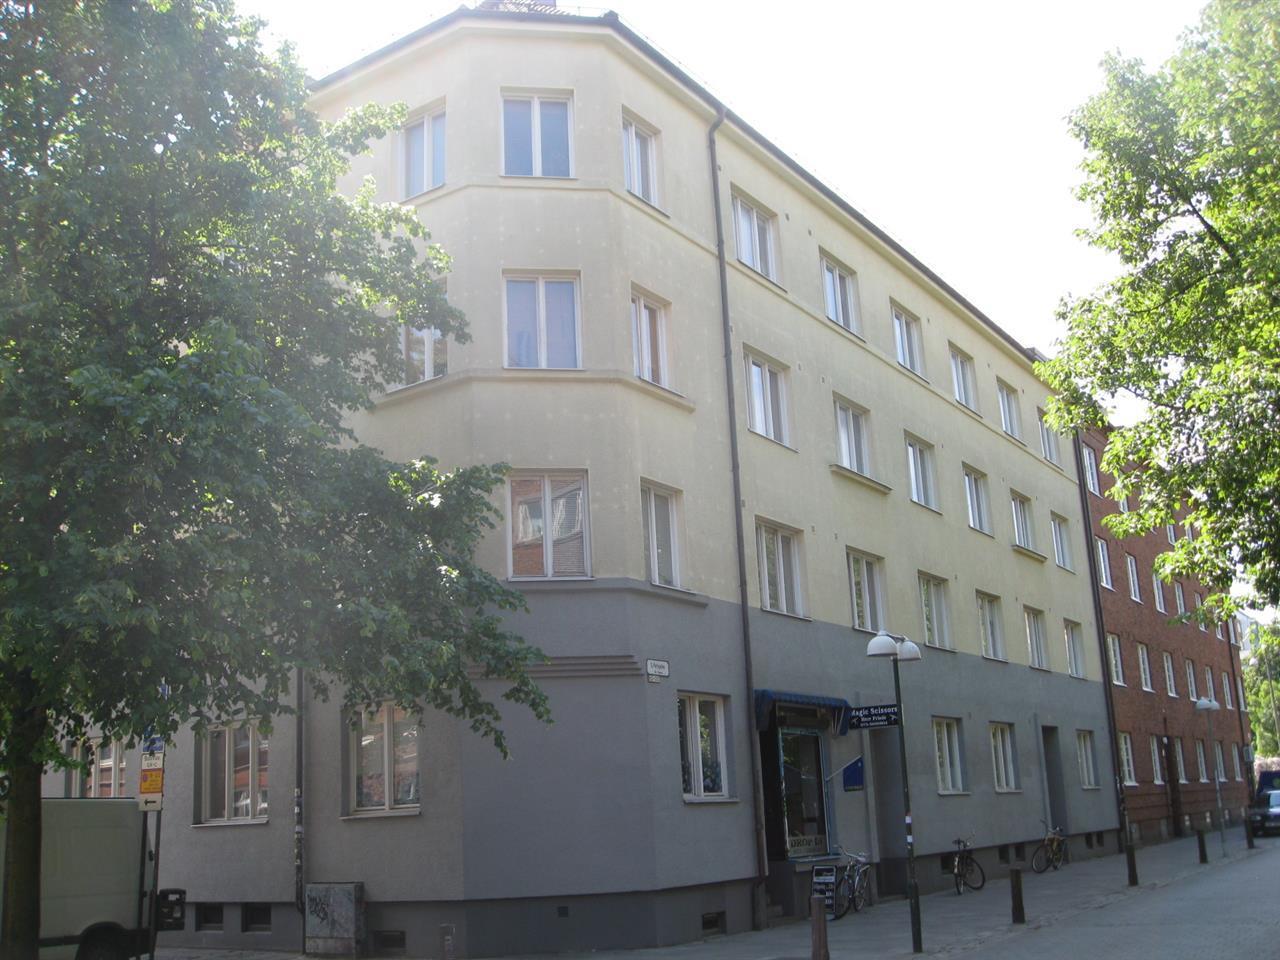 Simrishamnsgatan 11